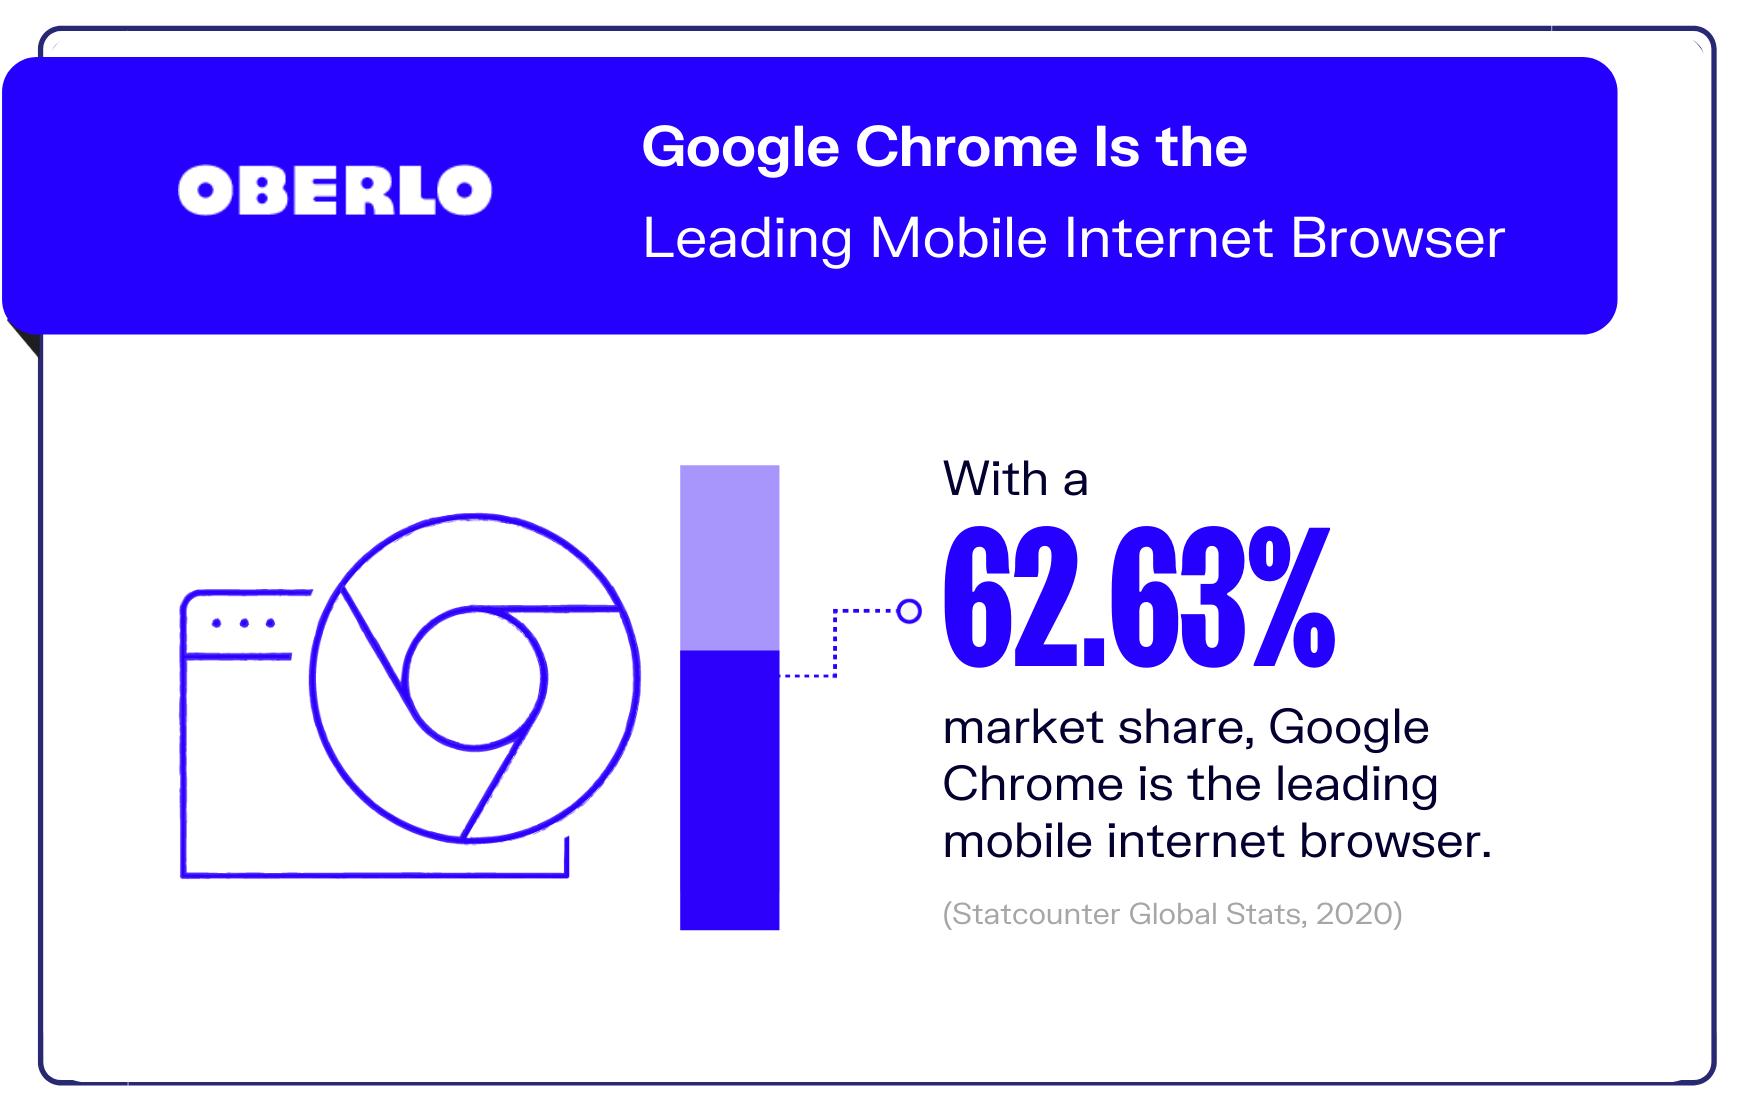 Internet statistic #7